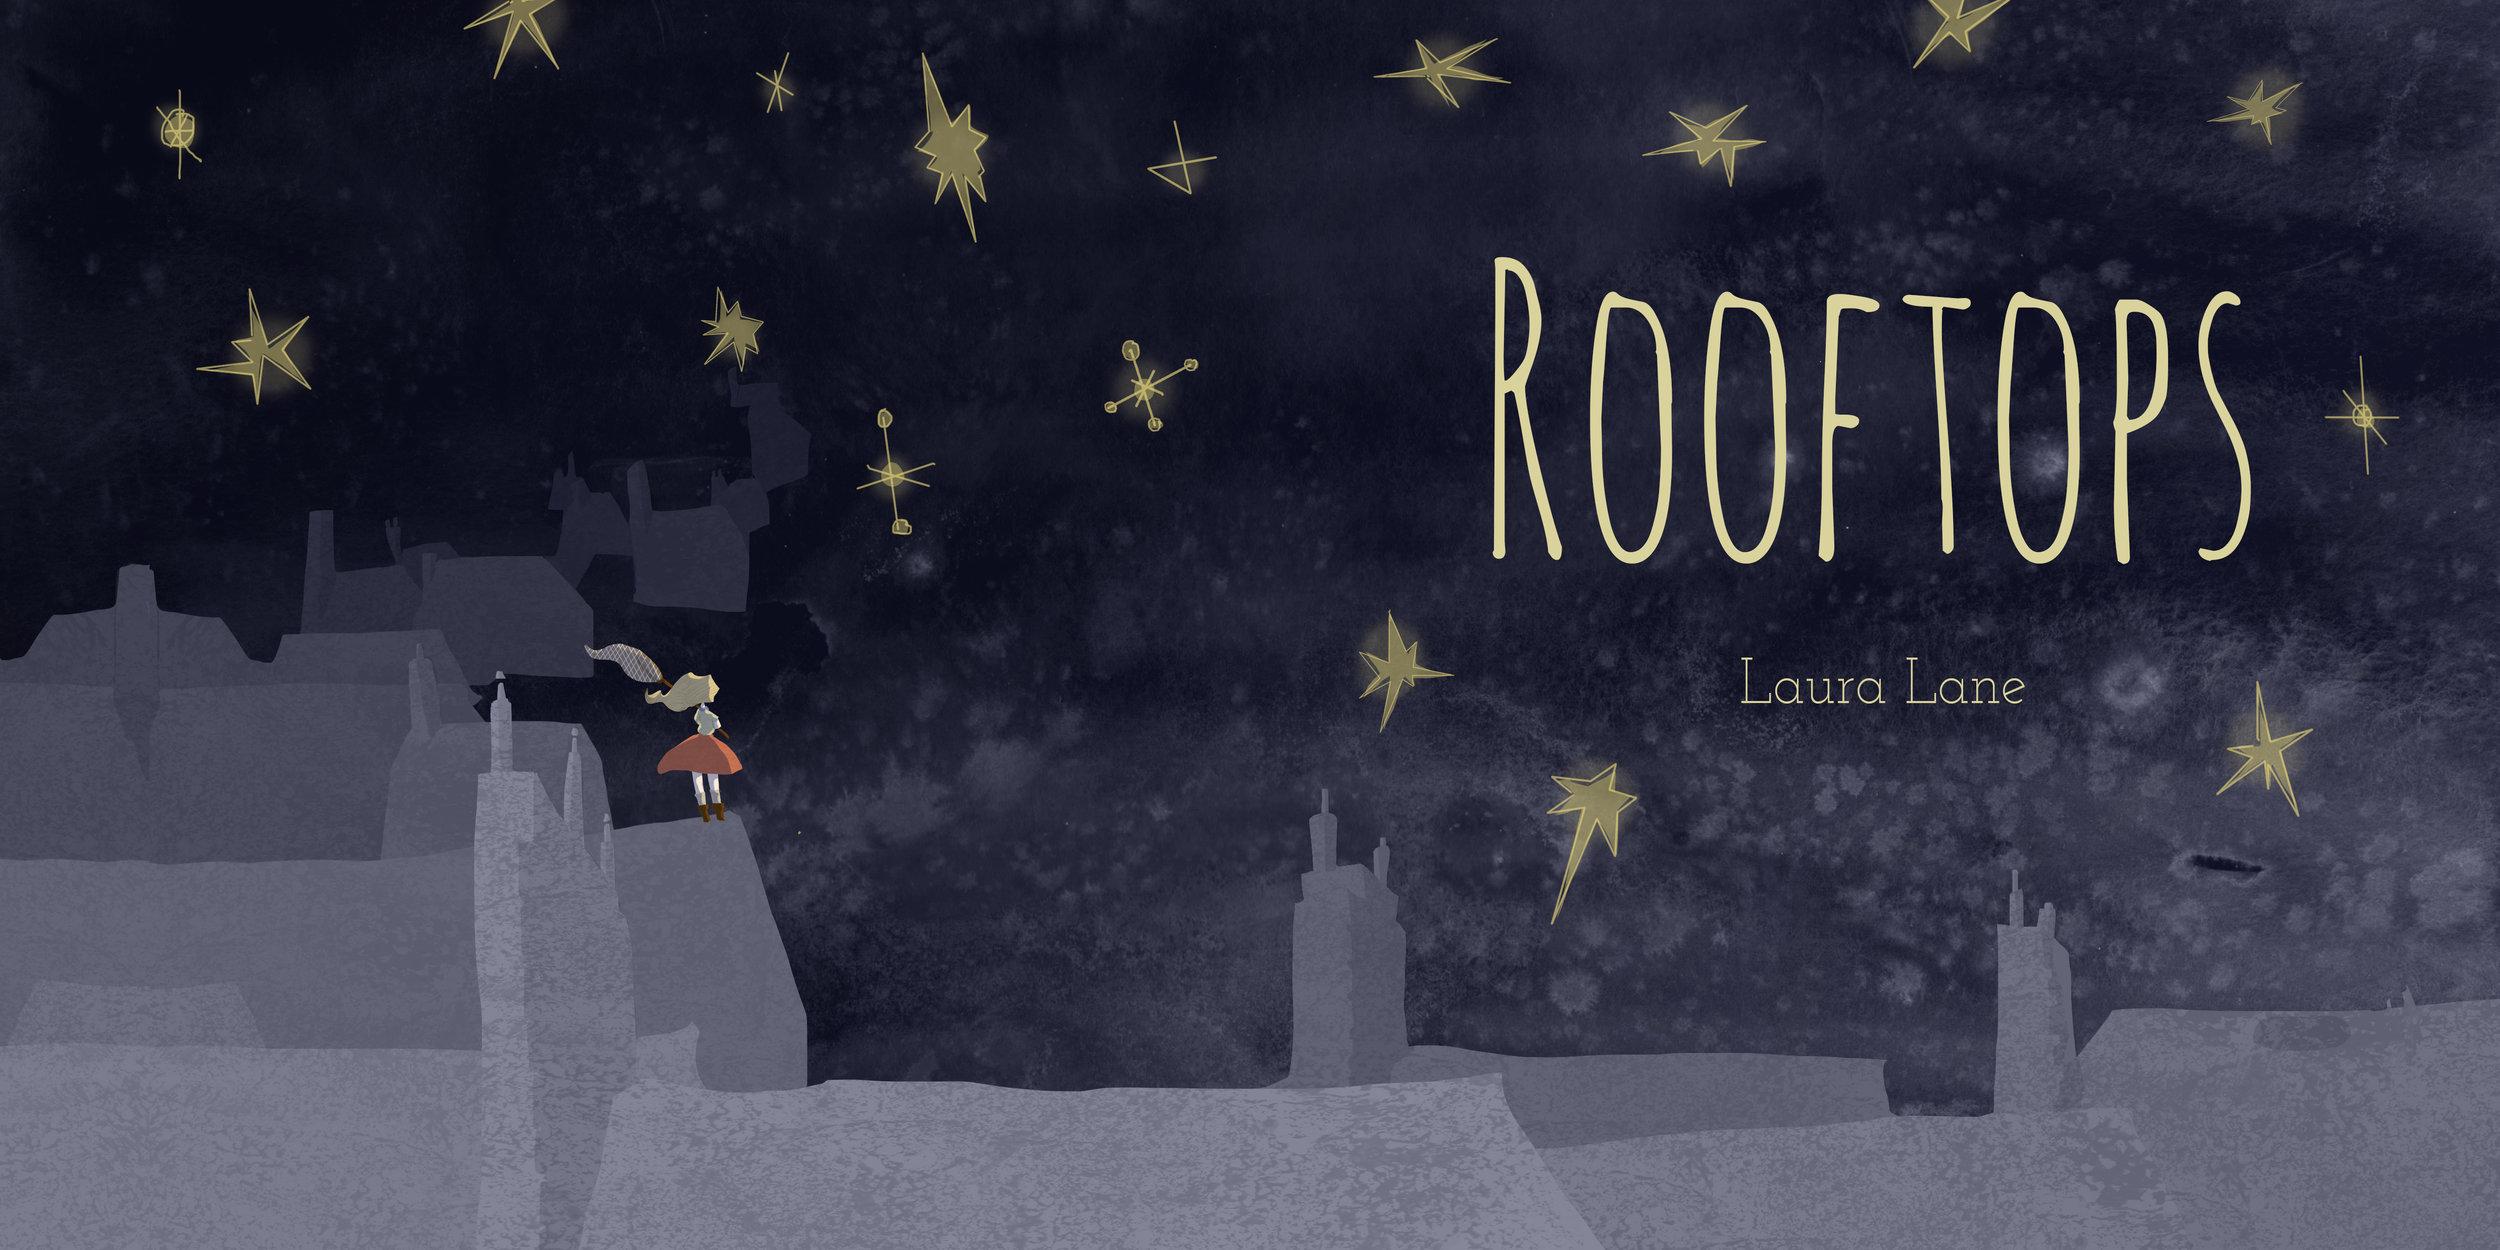 RooftopsCover.jpg